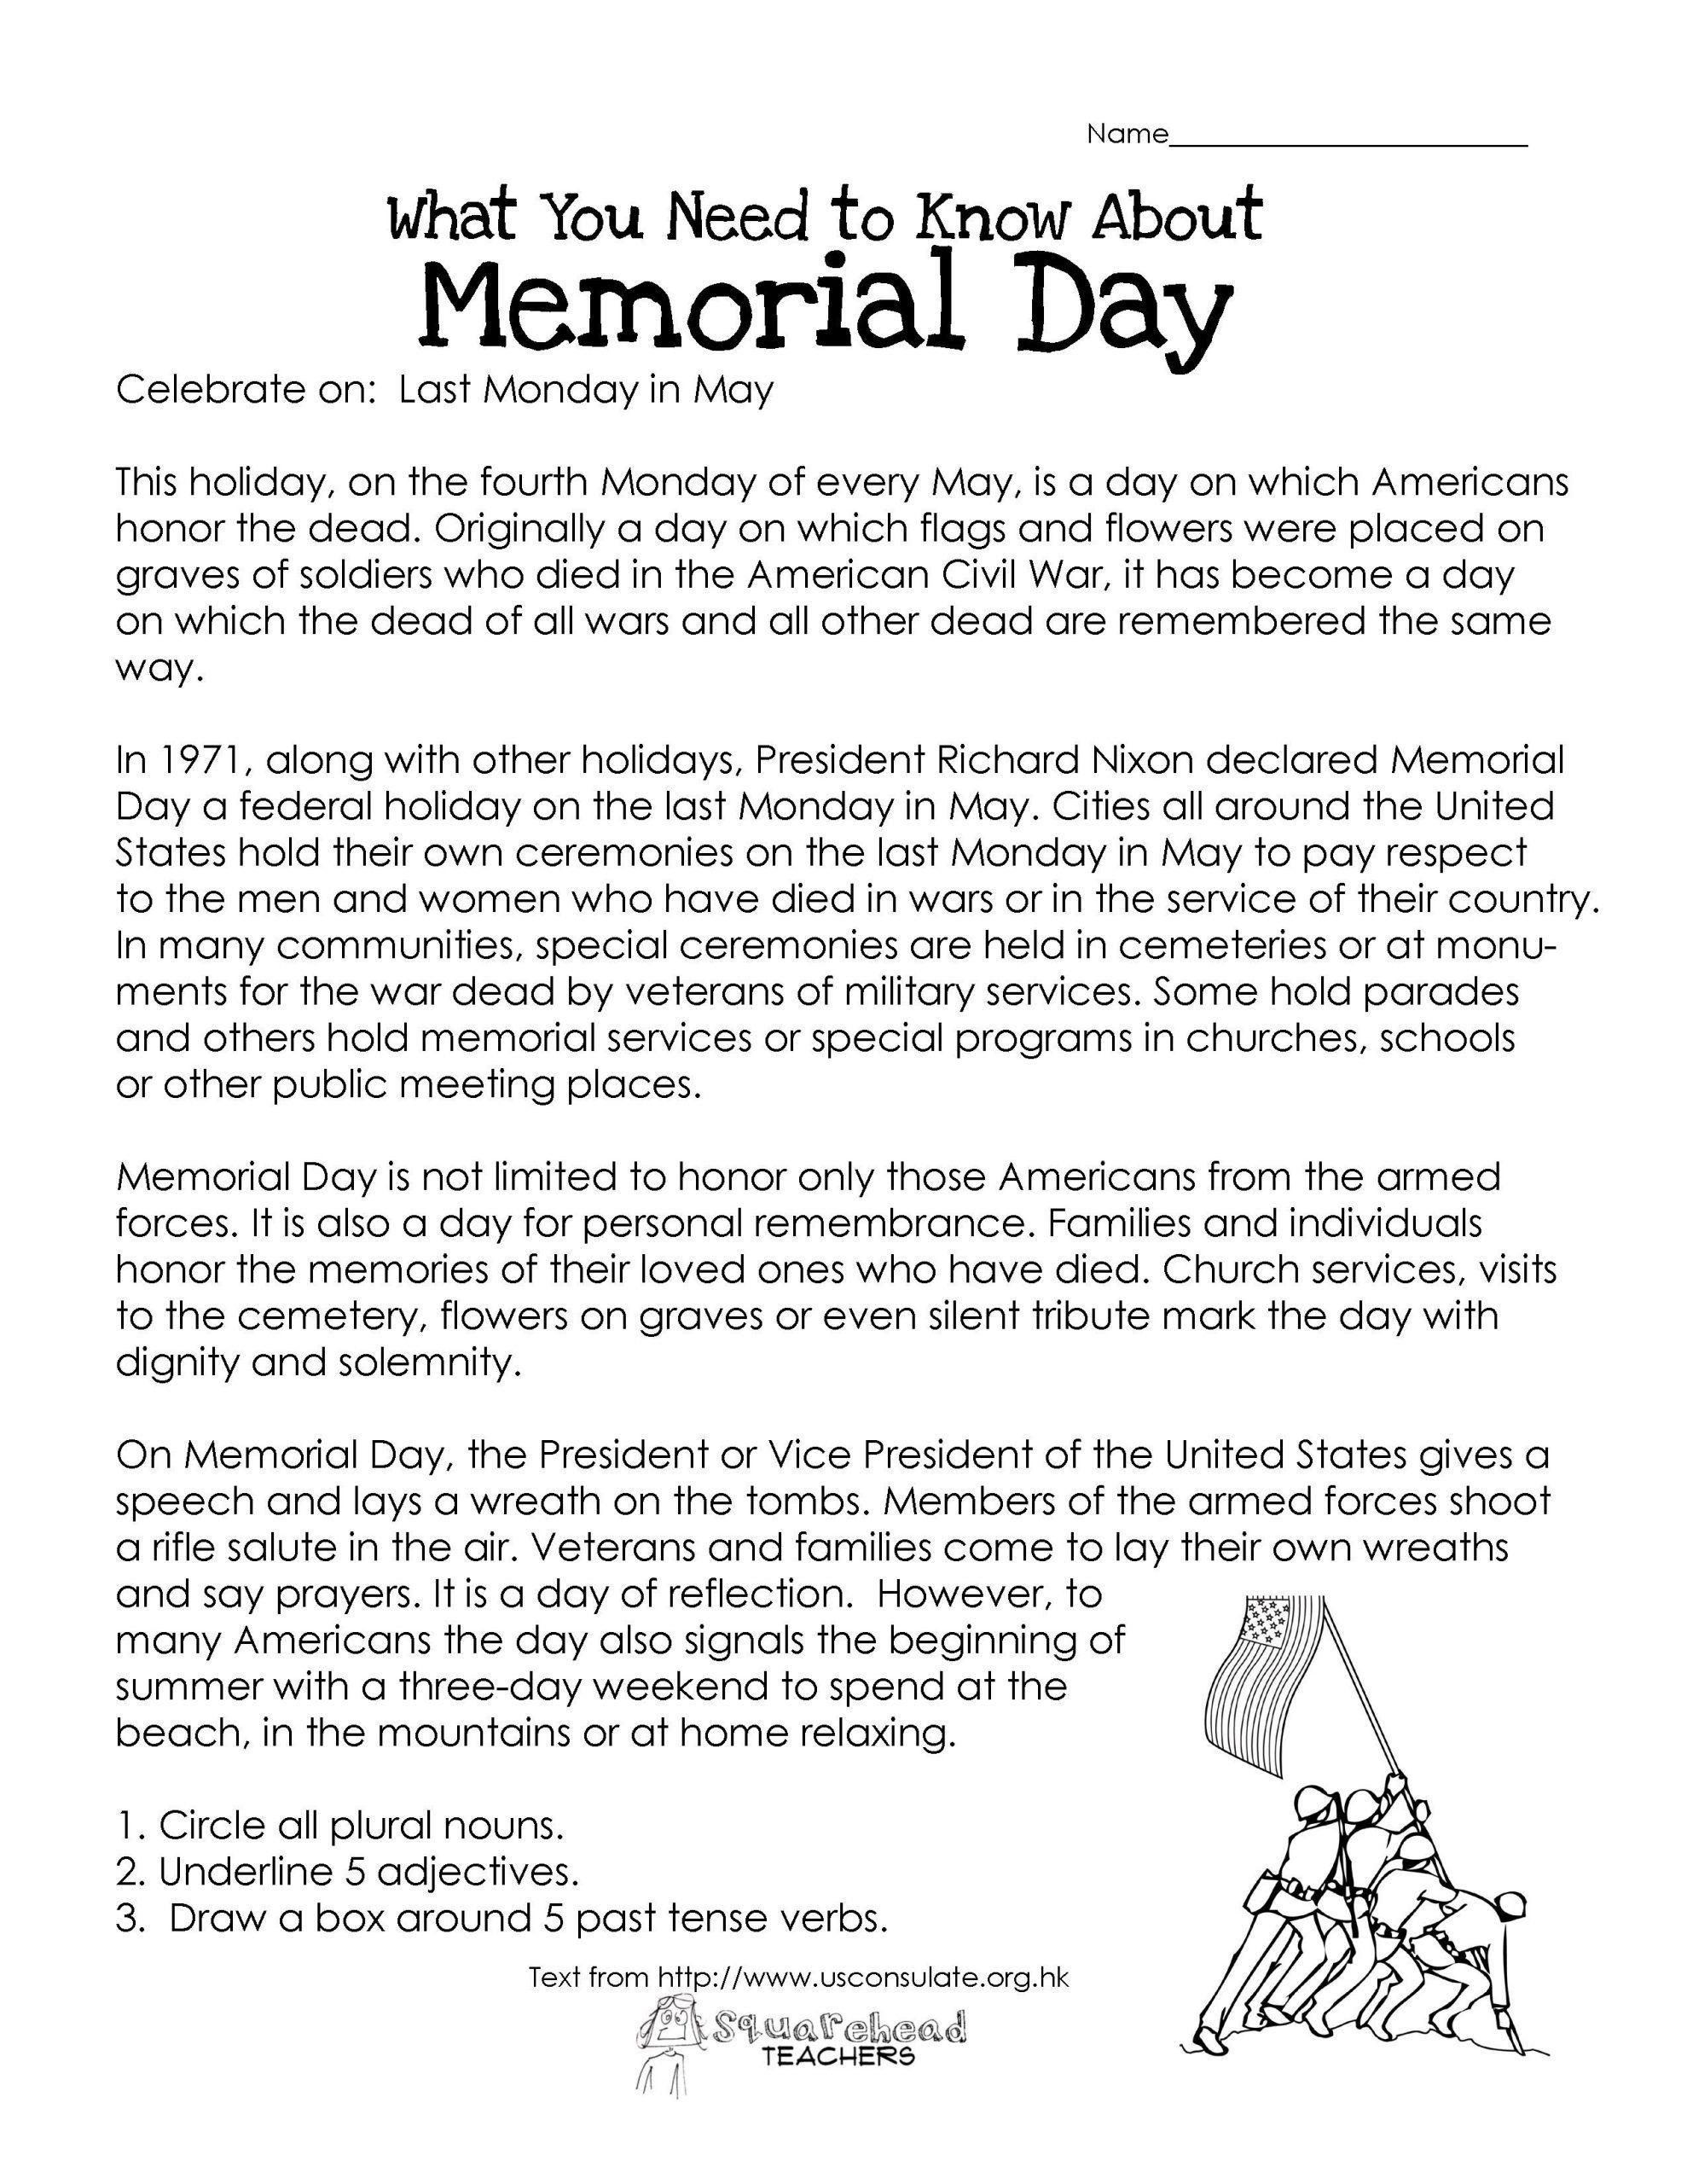 Memorial Day Worksheets For Kindergarten Worksheet For Kindergarten Memorial Day Activities Worksheets Free Writing Worksheets [ 2560 x 1978 Pixel ]